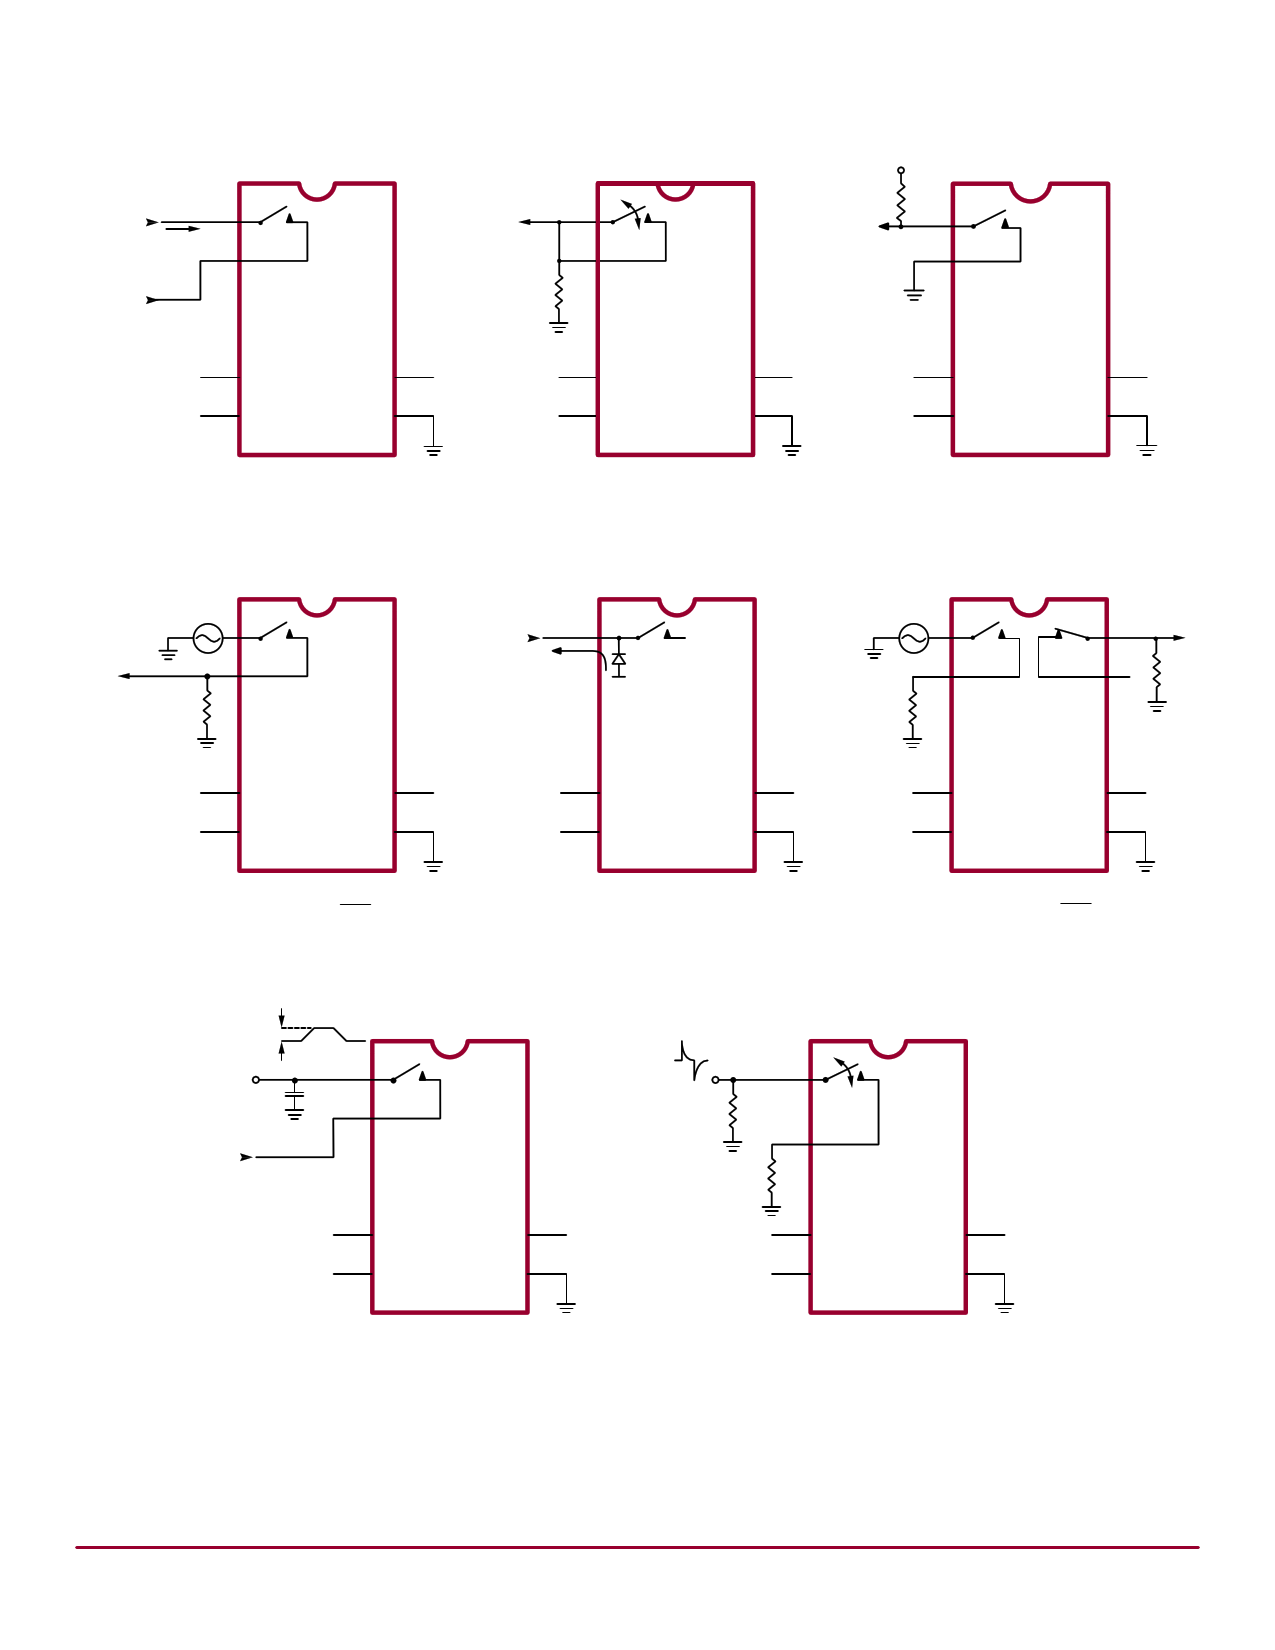 HV20320PJ 電子部品, 半導体